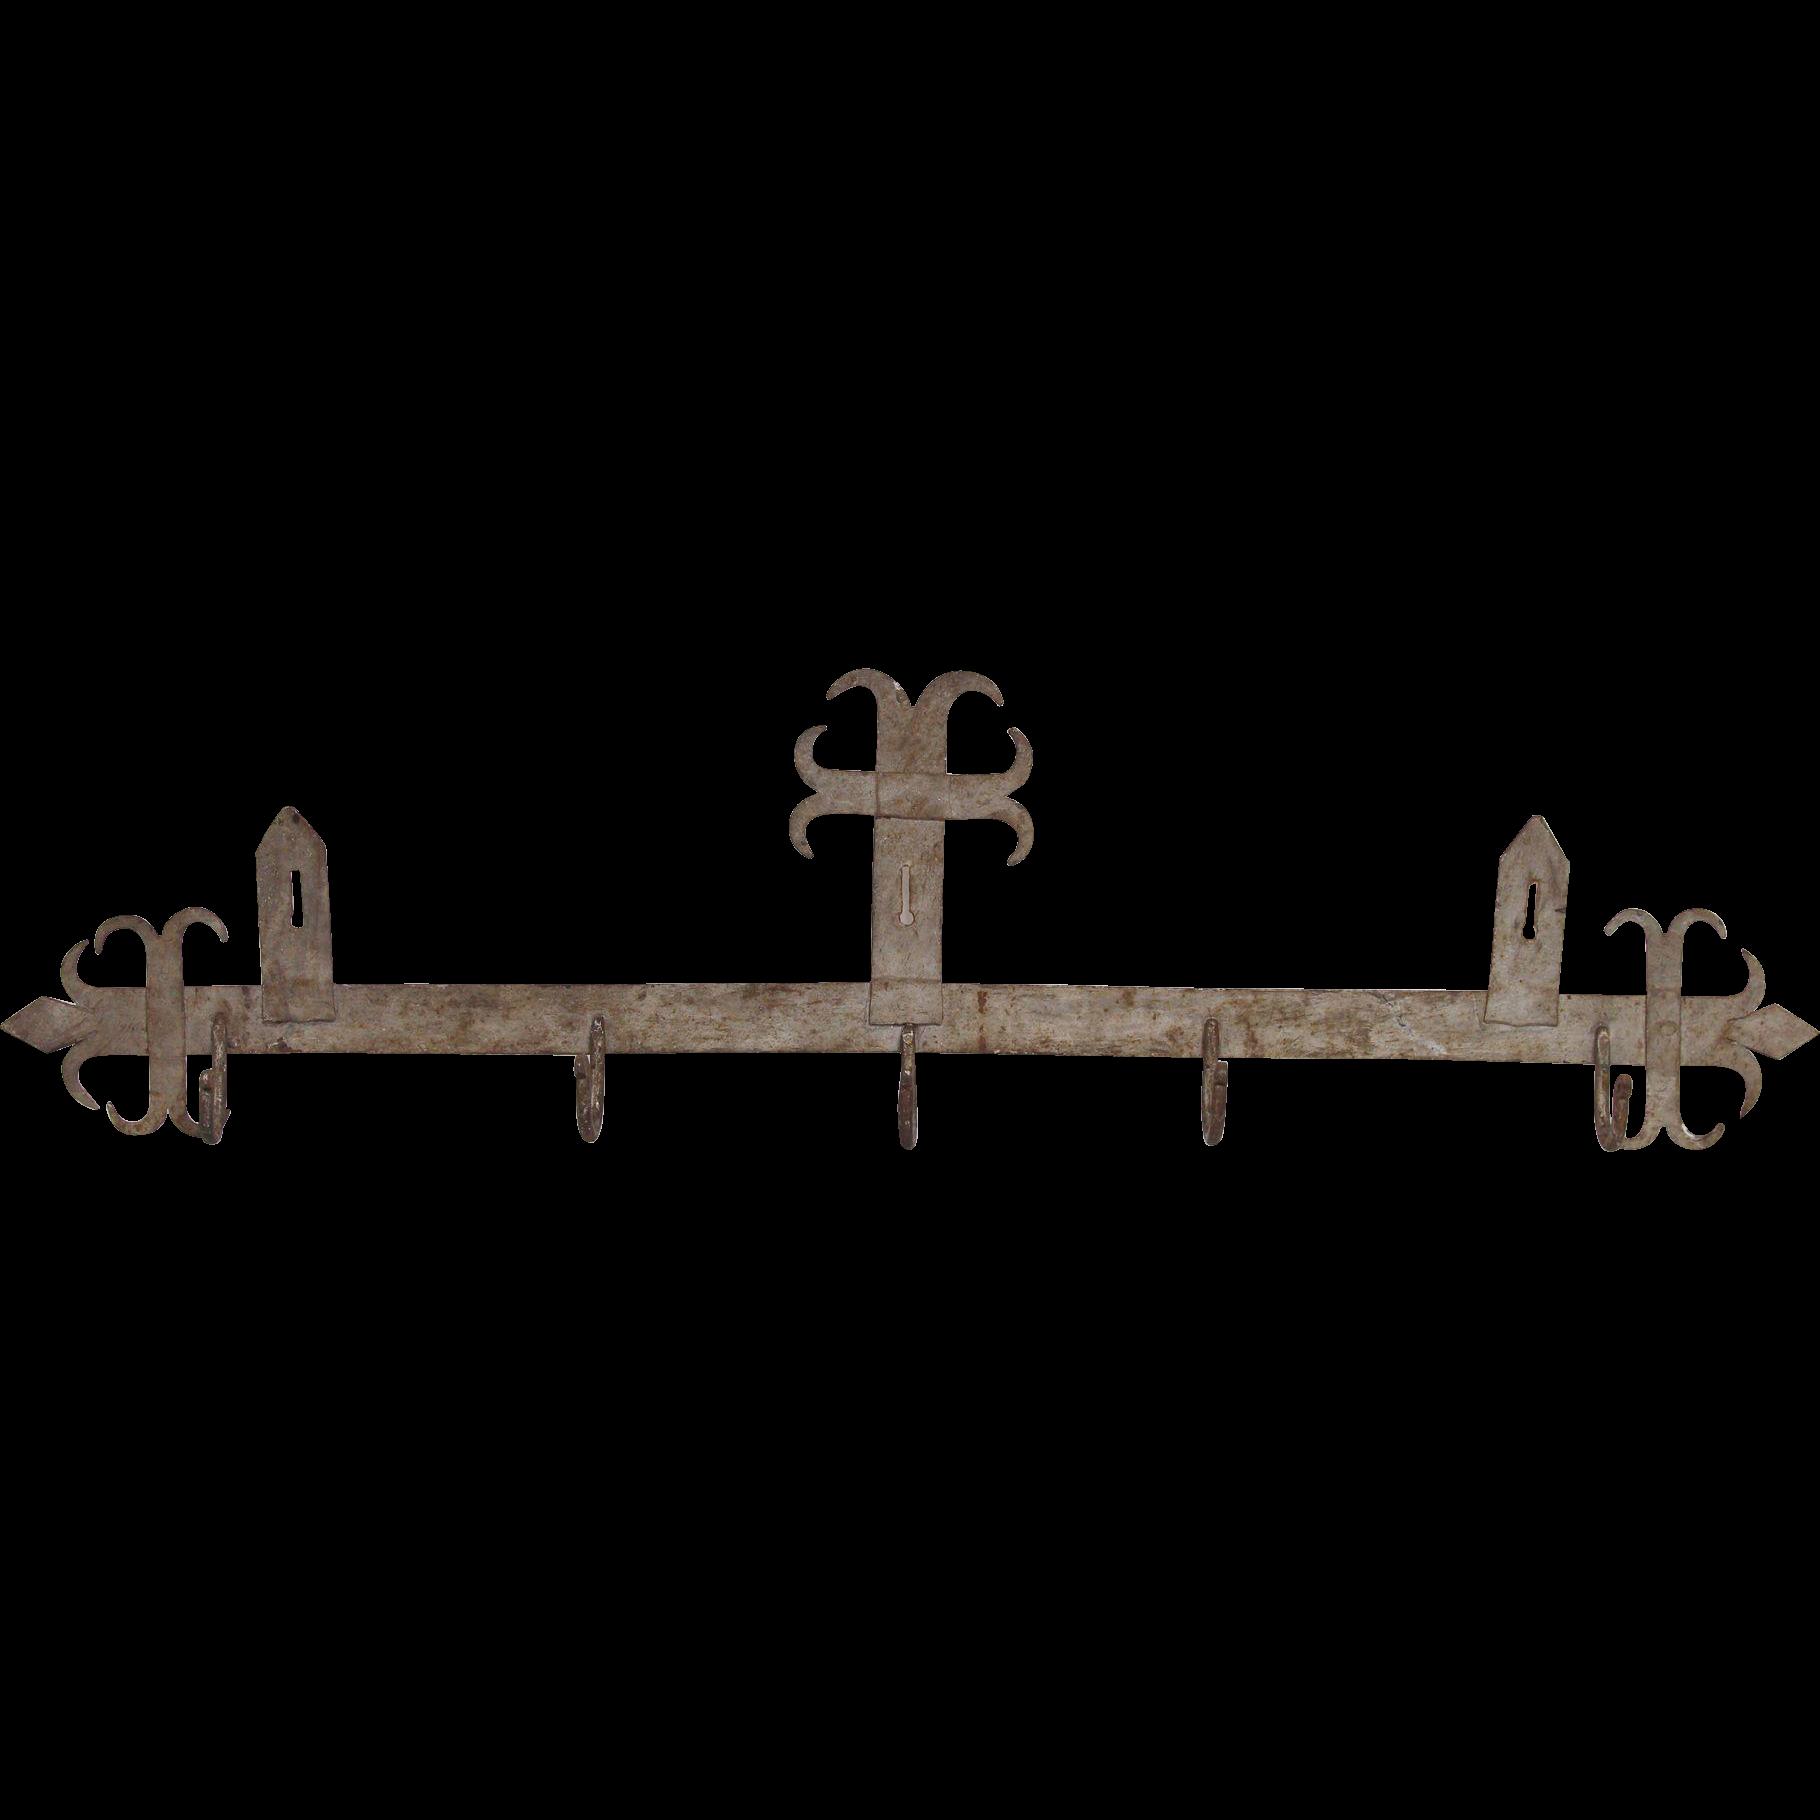 Arts & Crafts metal wall hook rack